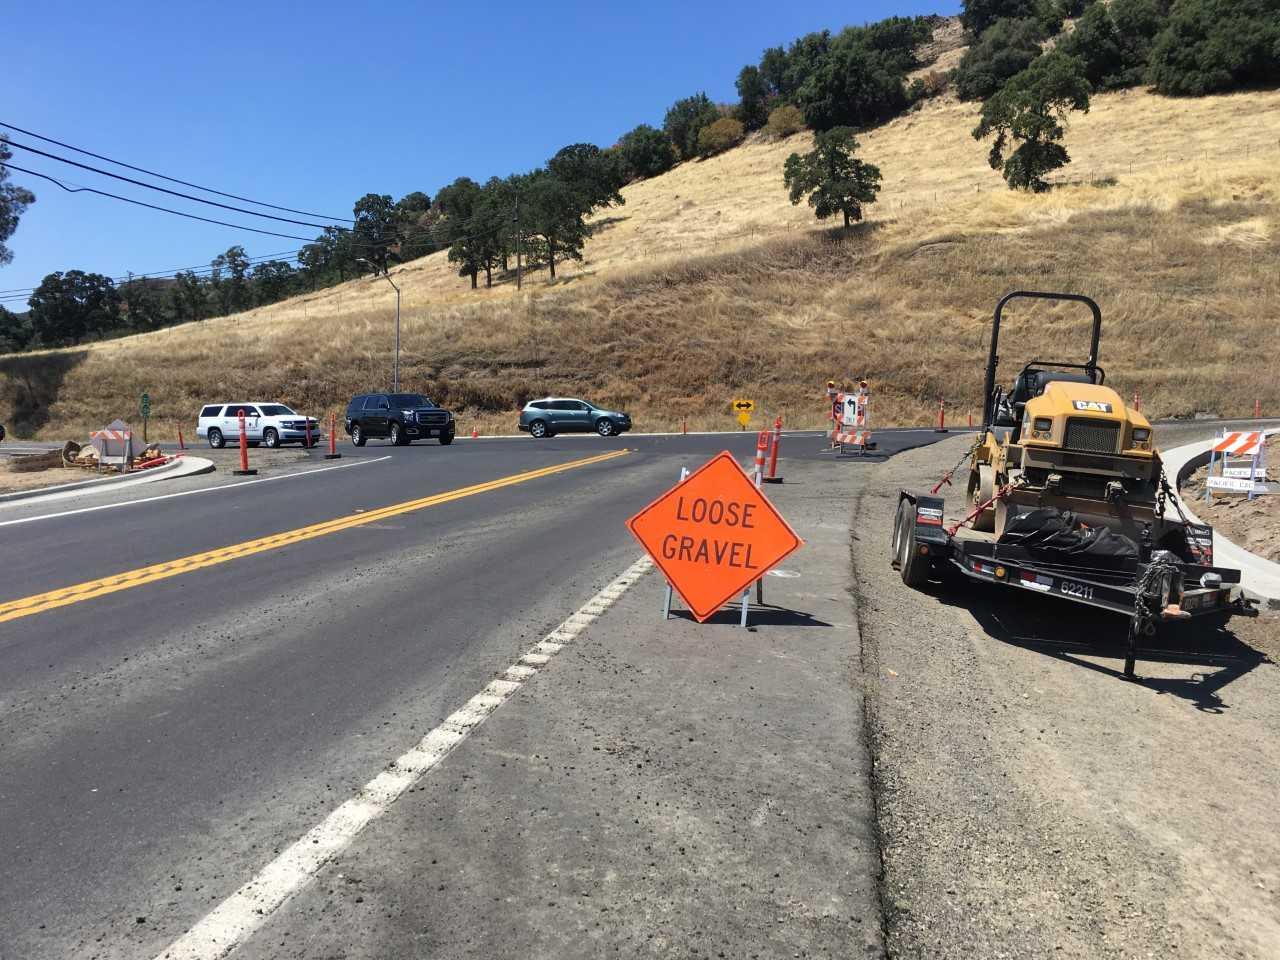 Highway Road Work In August | myMotherLode com